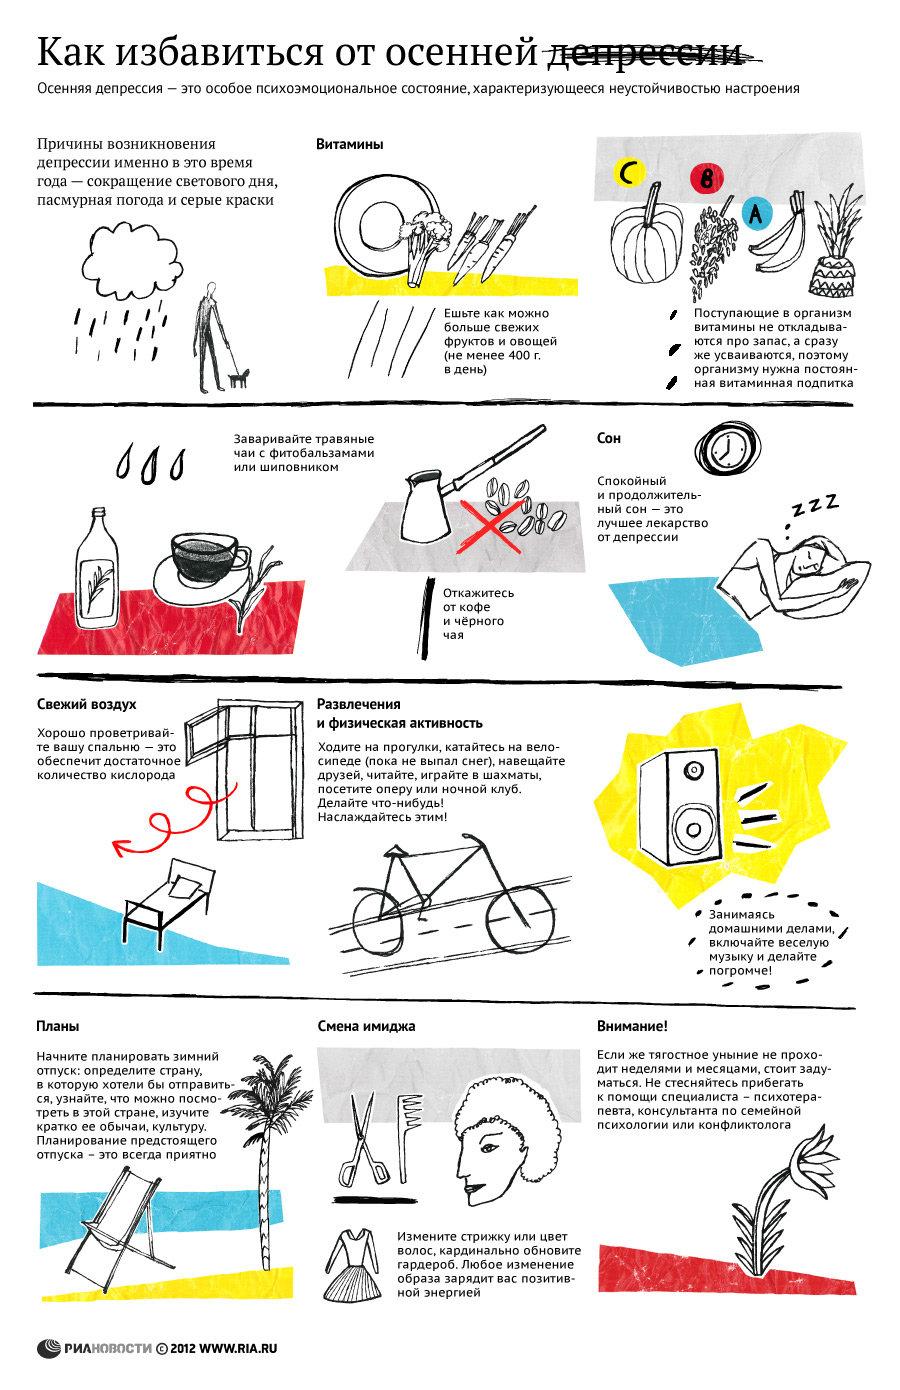 Картинки про осень и здоровье